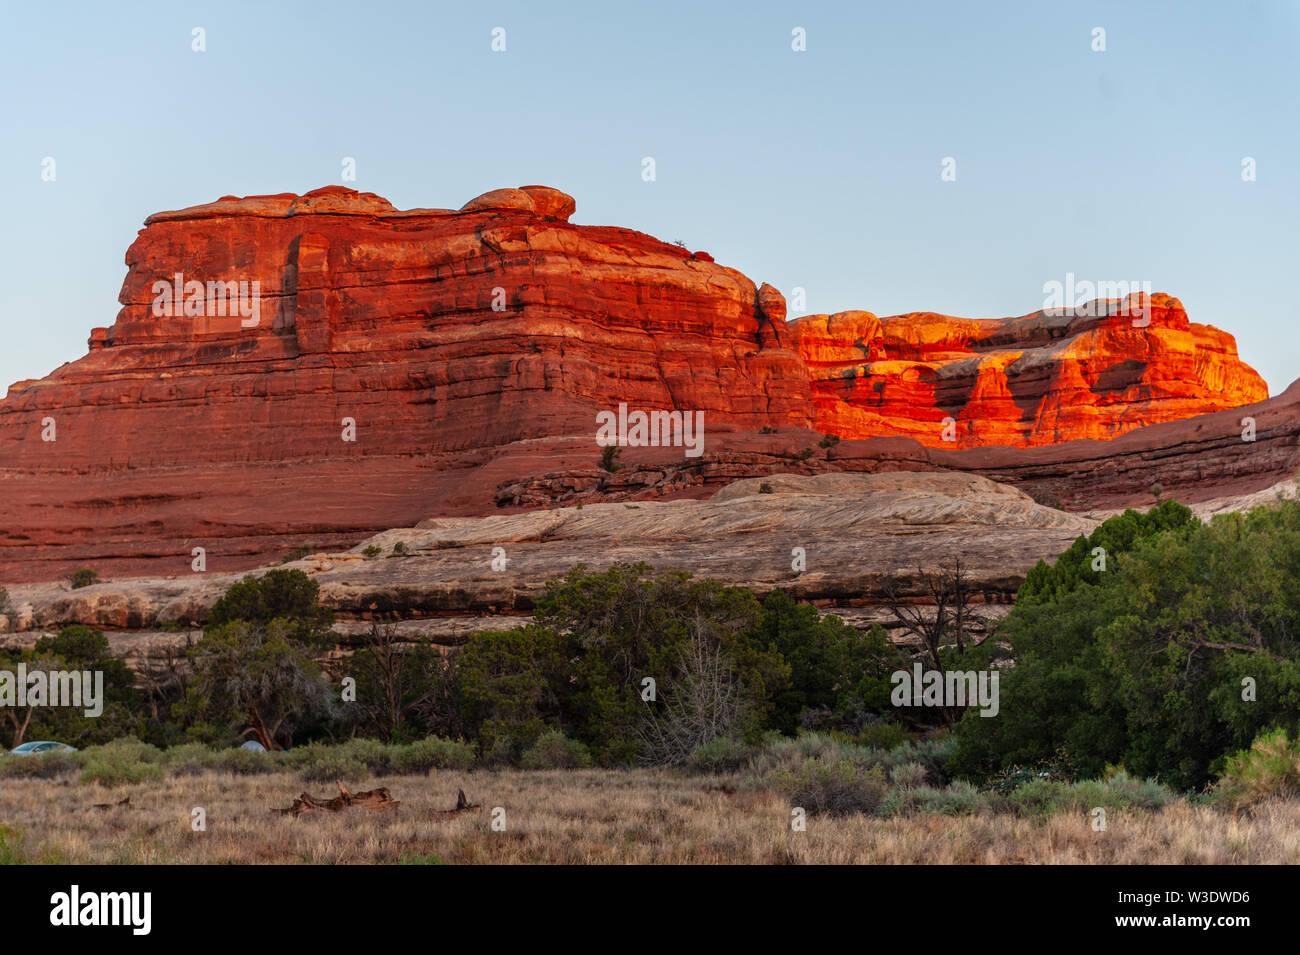 Sonnenaufgang im Needles District Campground. Canyonlands National Park, Utah Stockbild